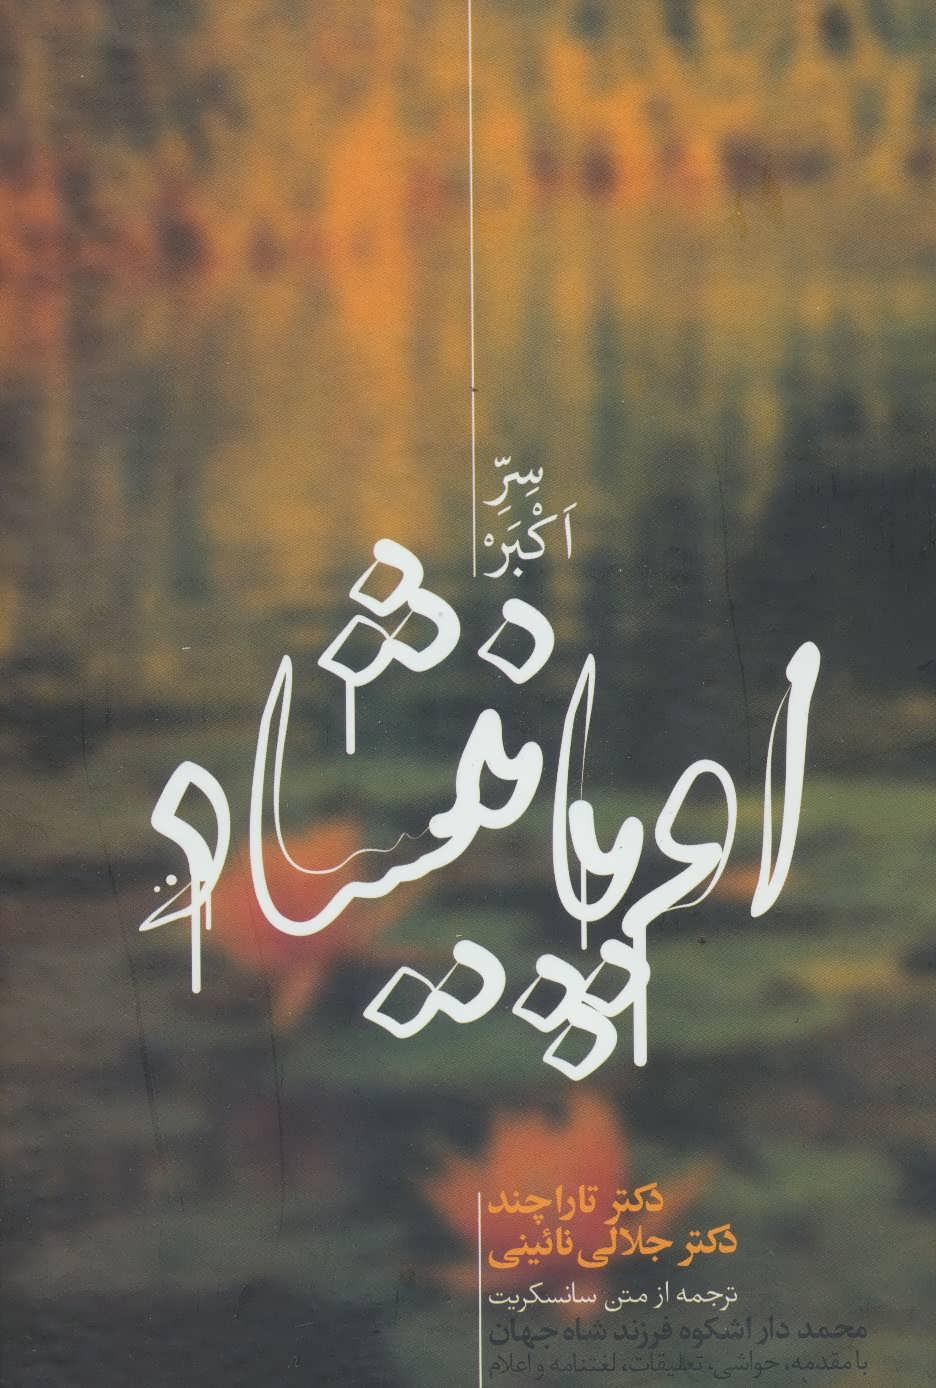 اوپانیشاد (سر اکبر)،(2جلدی)